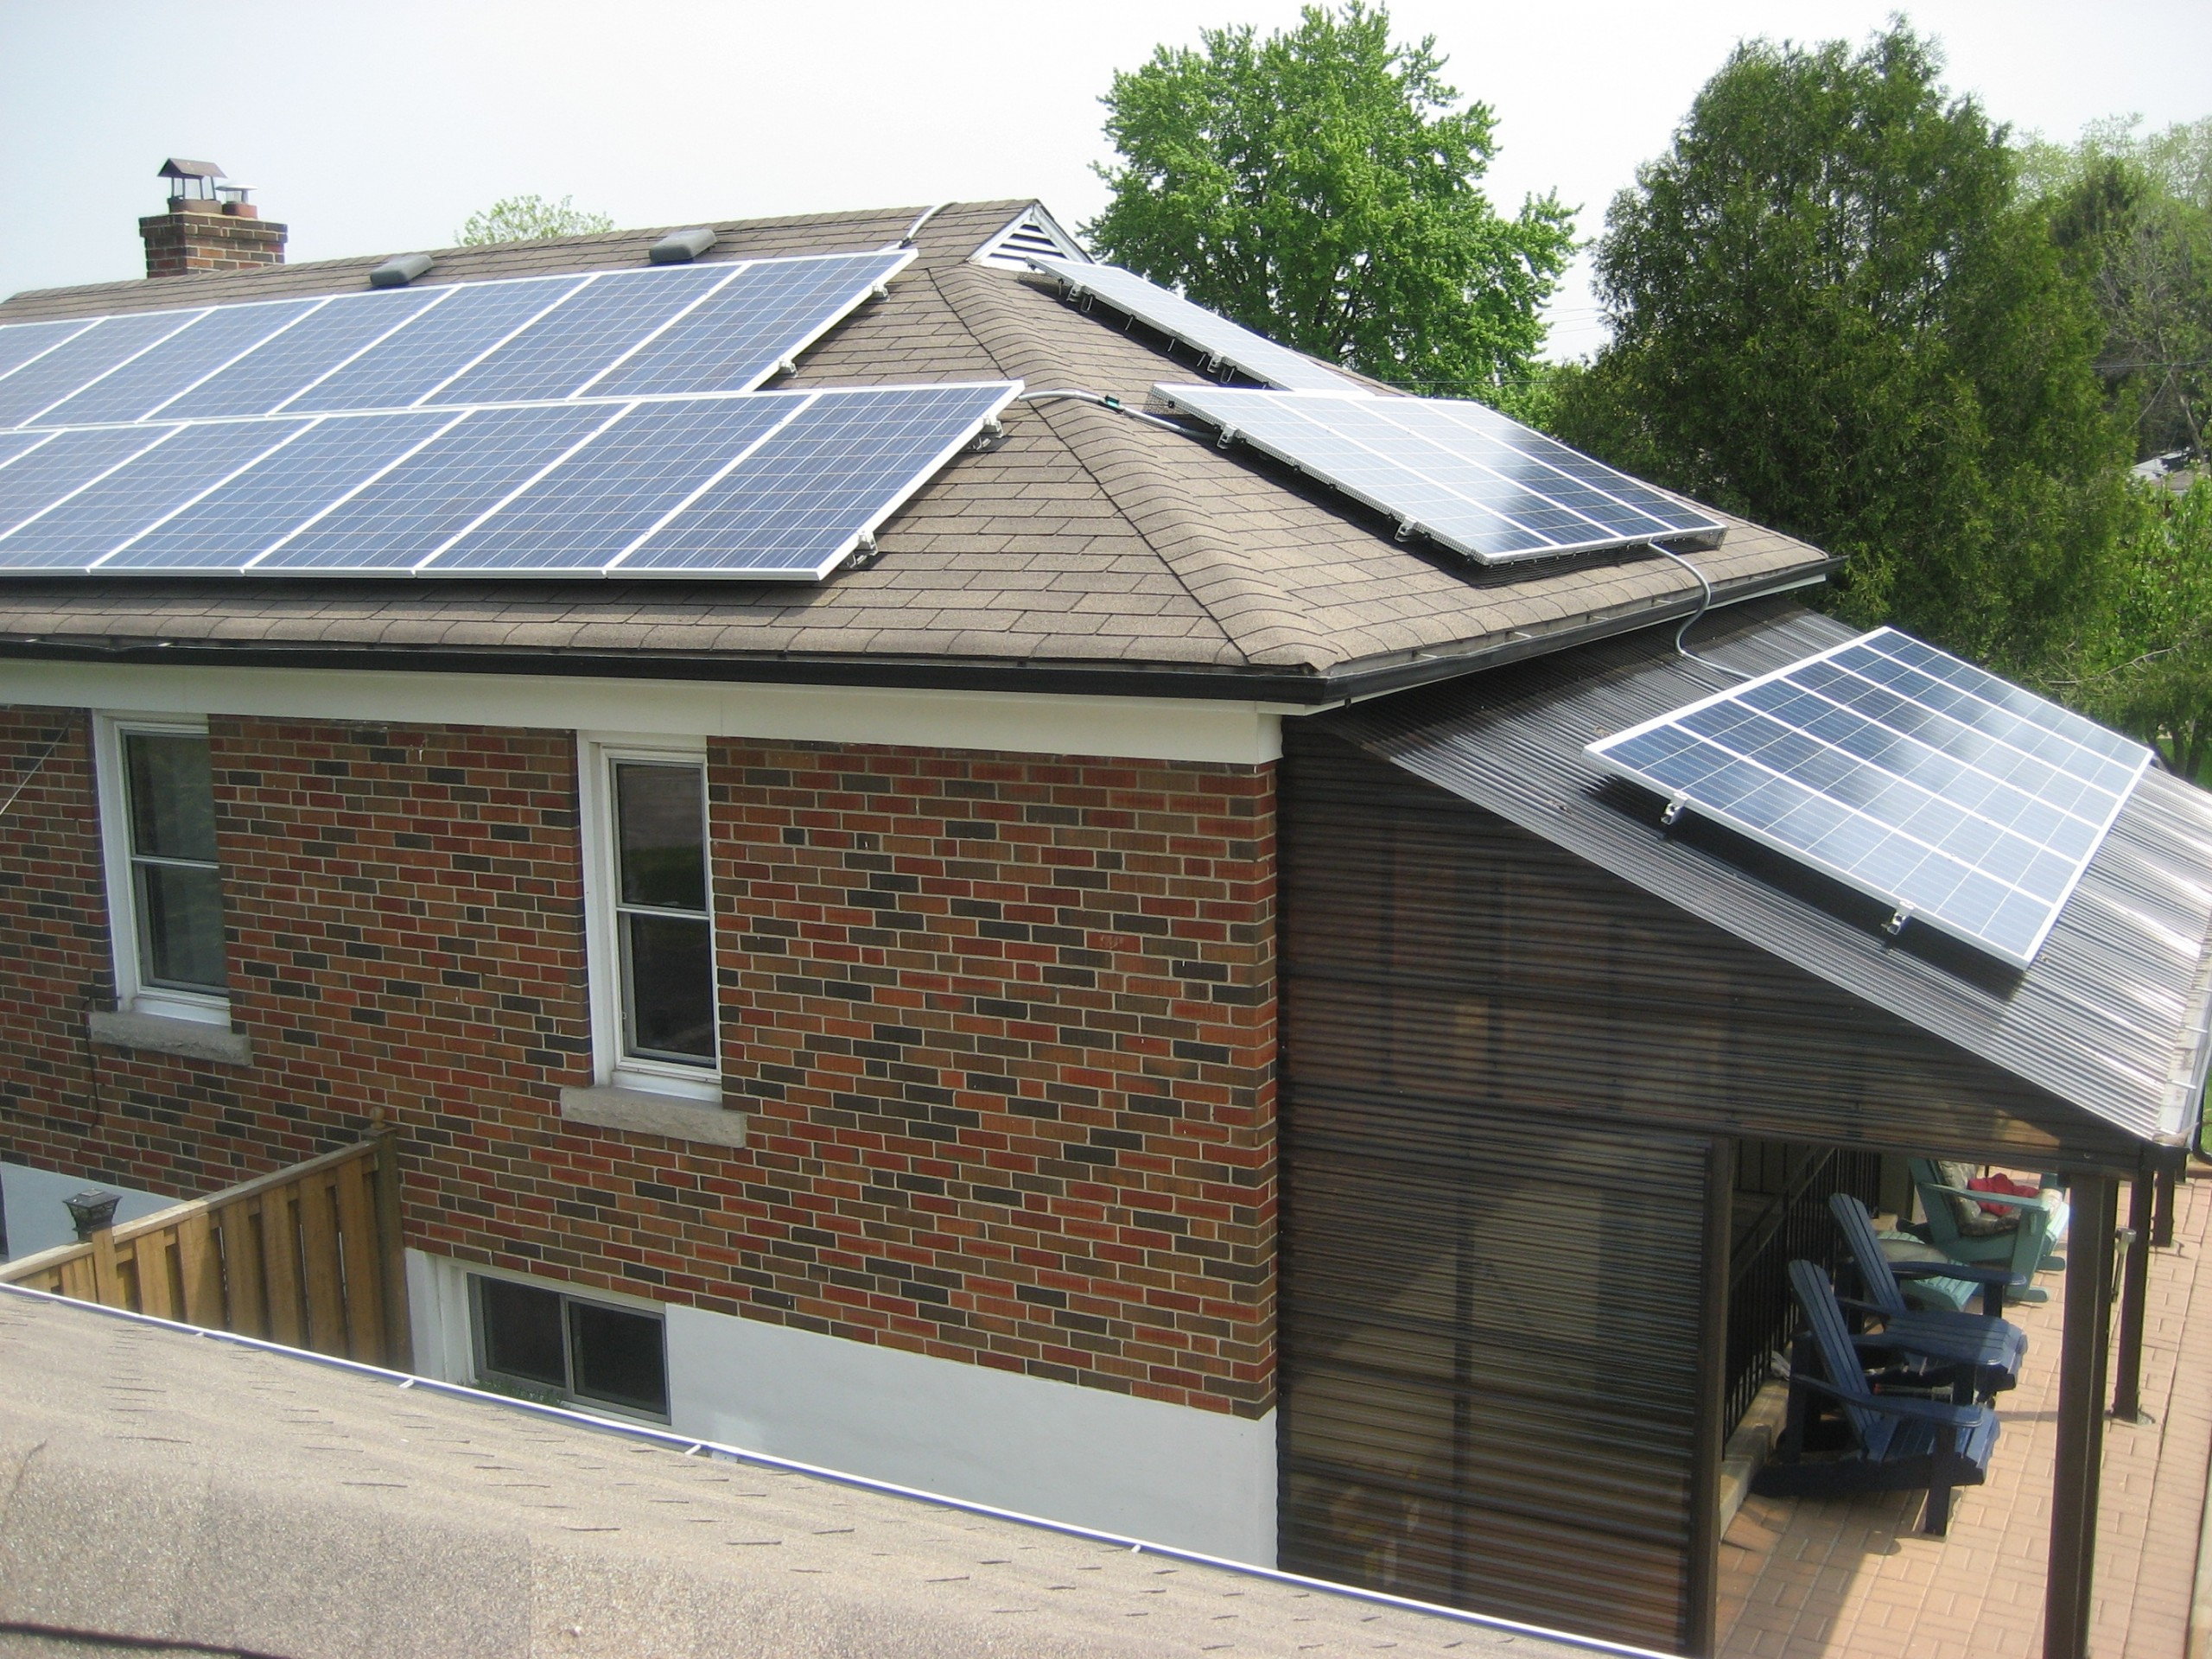 London organization installing solar projects across city